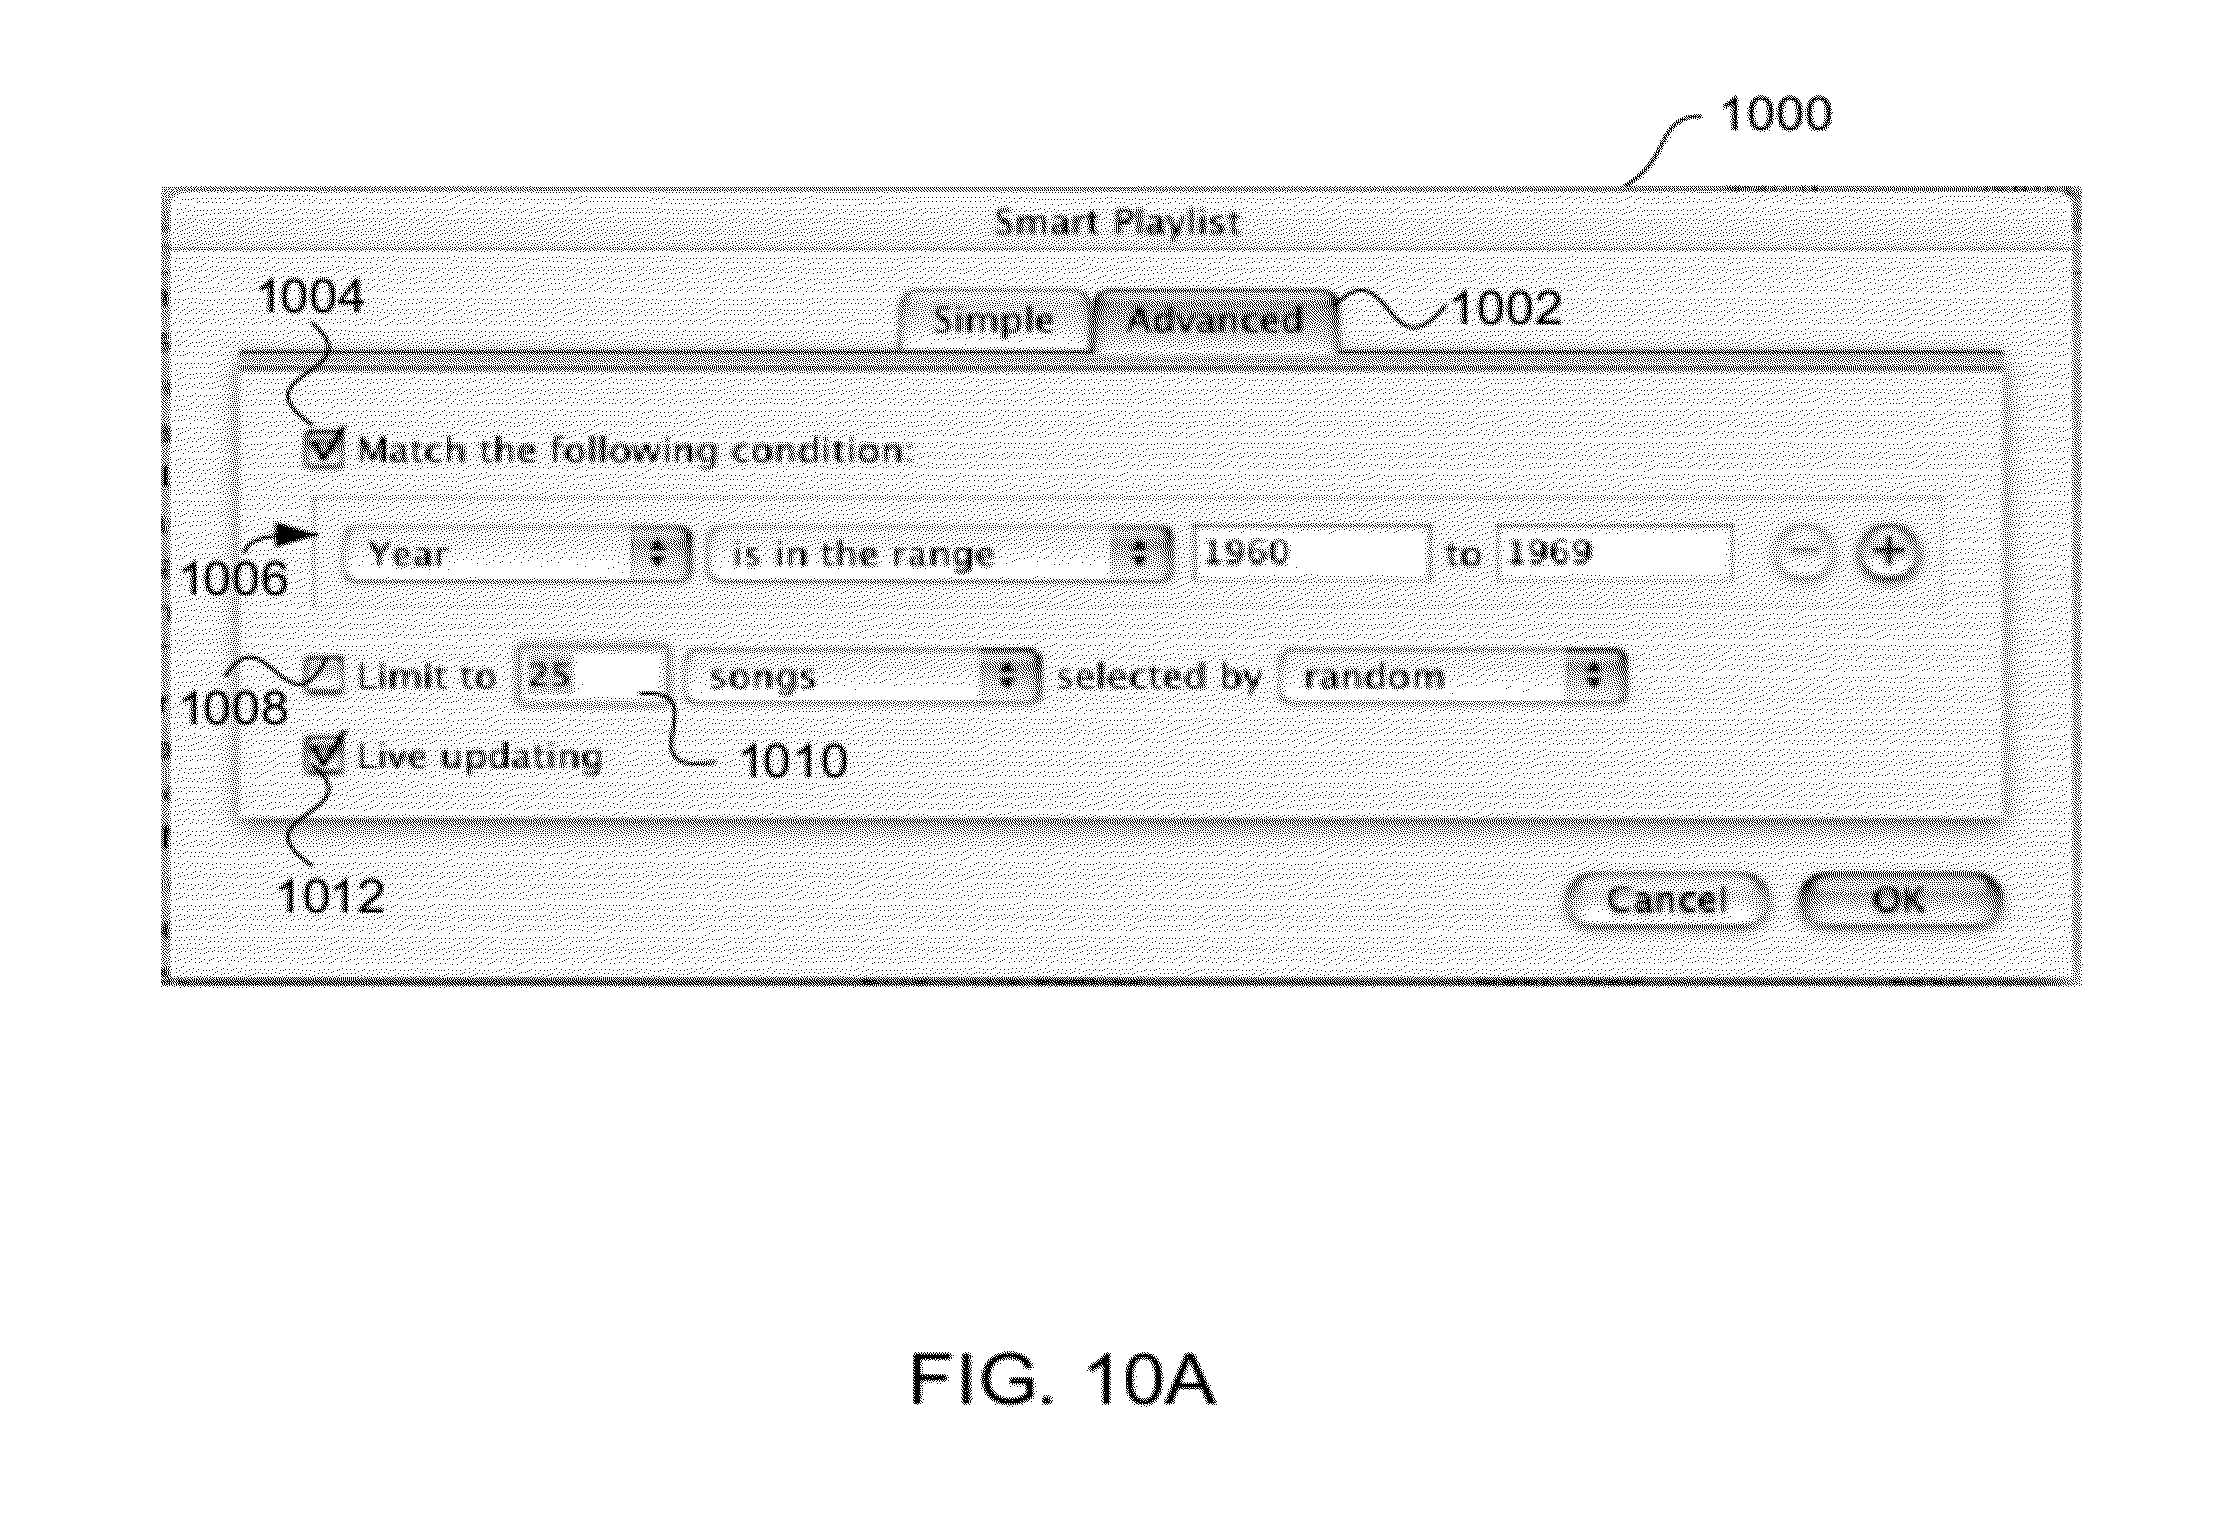 Patent US 8,495,246 B2